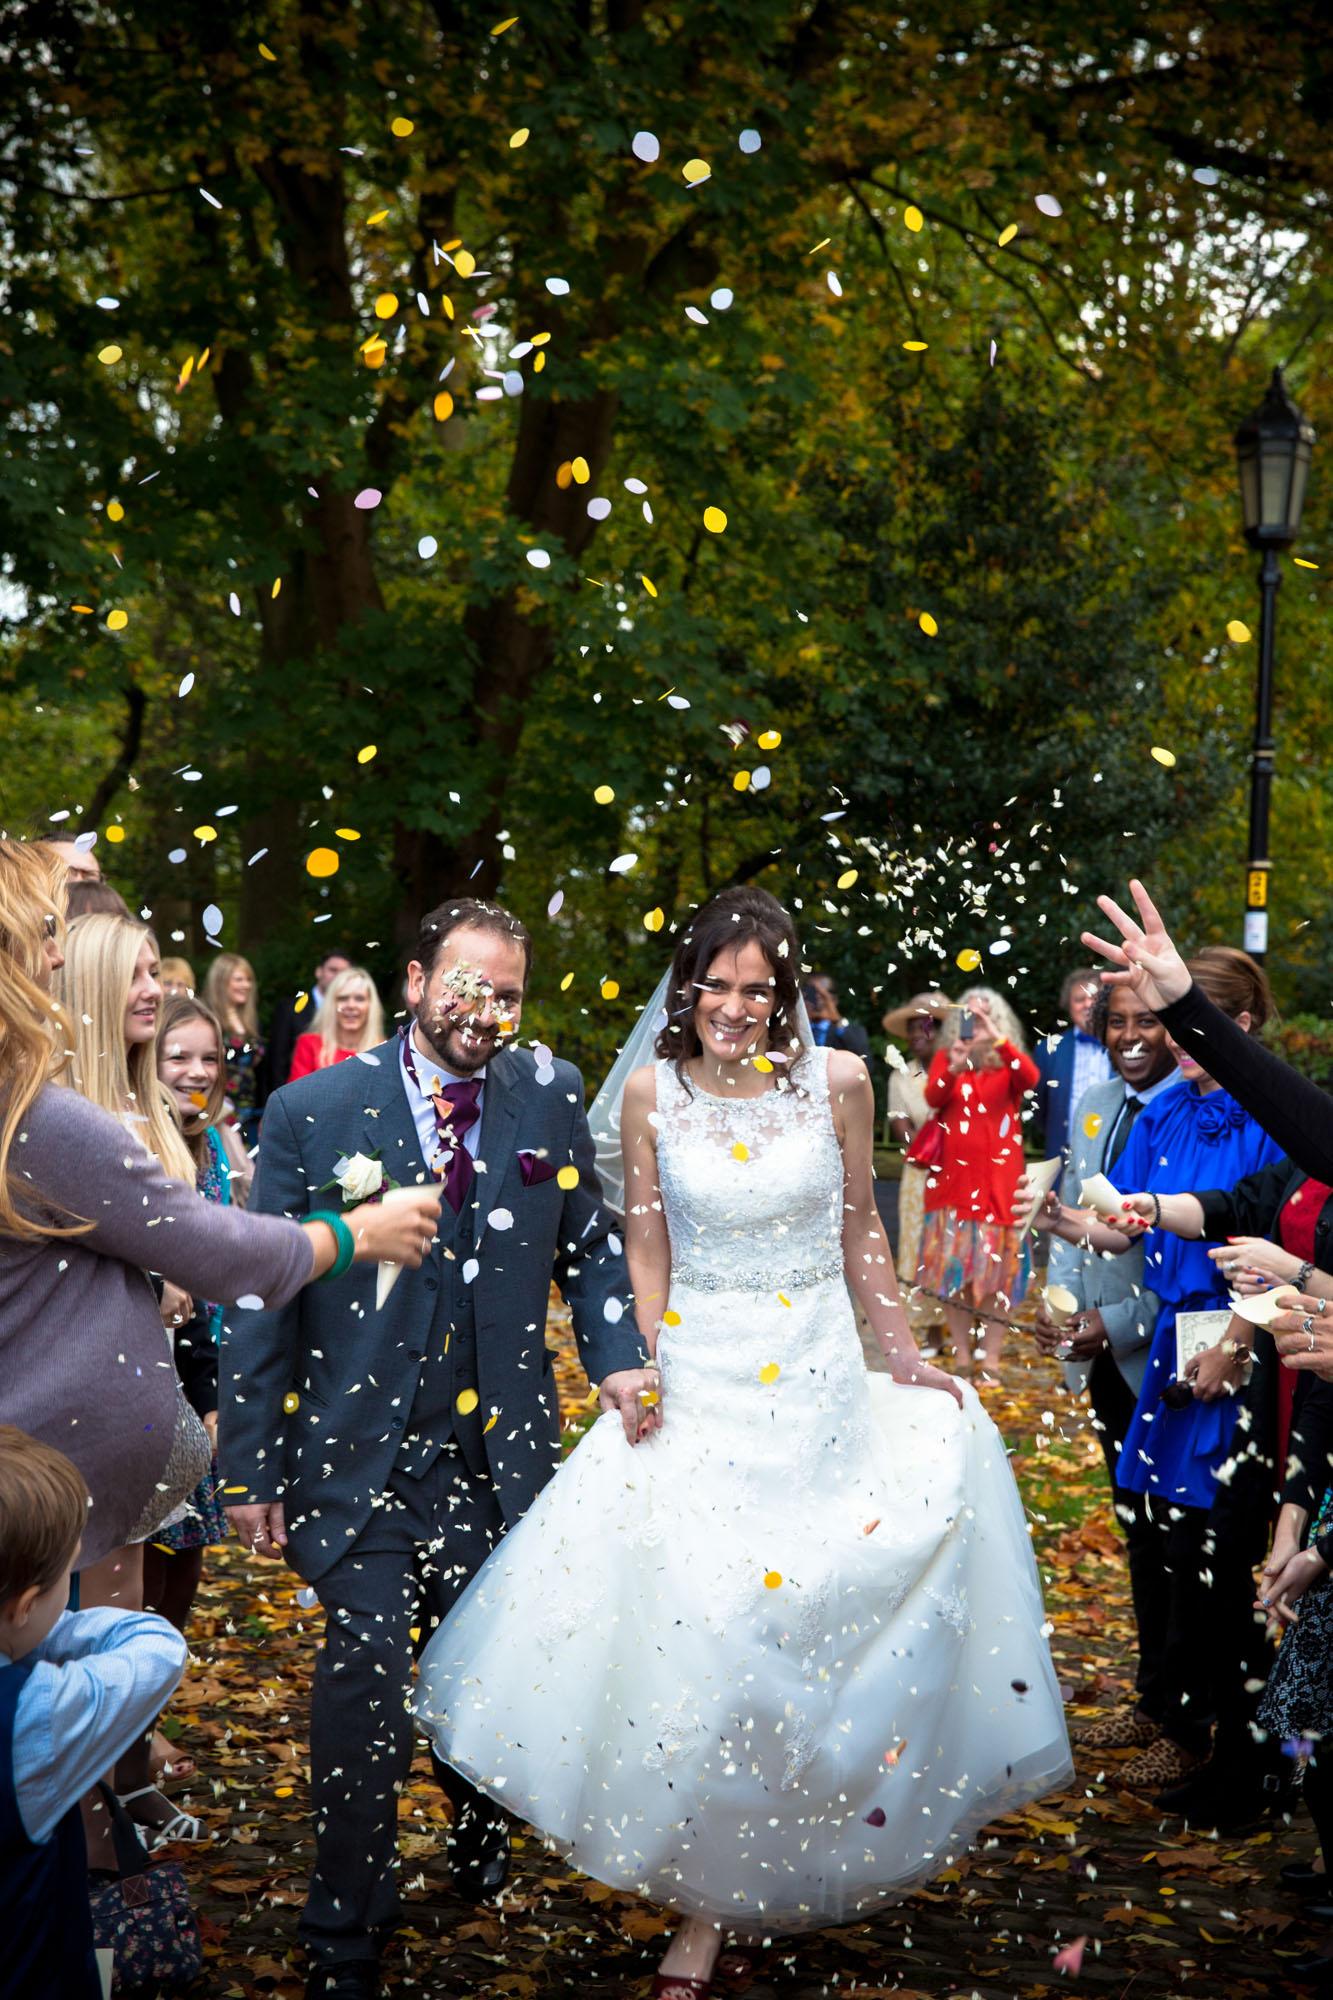 weddings-couples-love-photographer-oxford-london-jonathan-self-photography-44.jpg